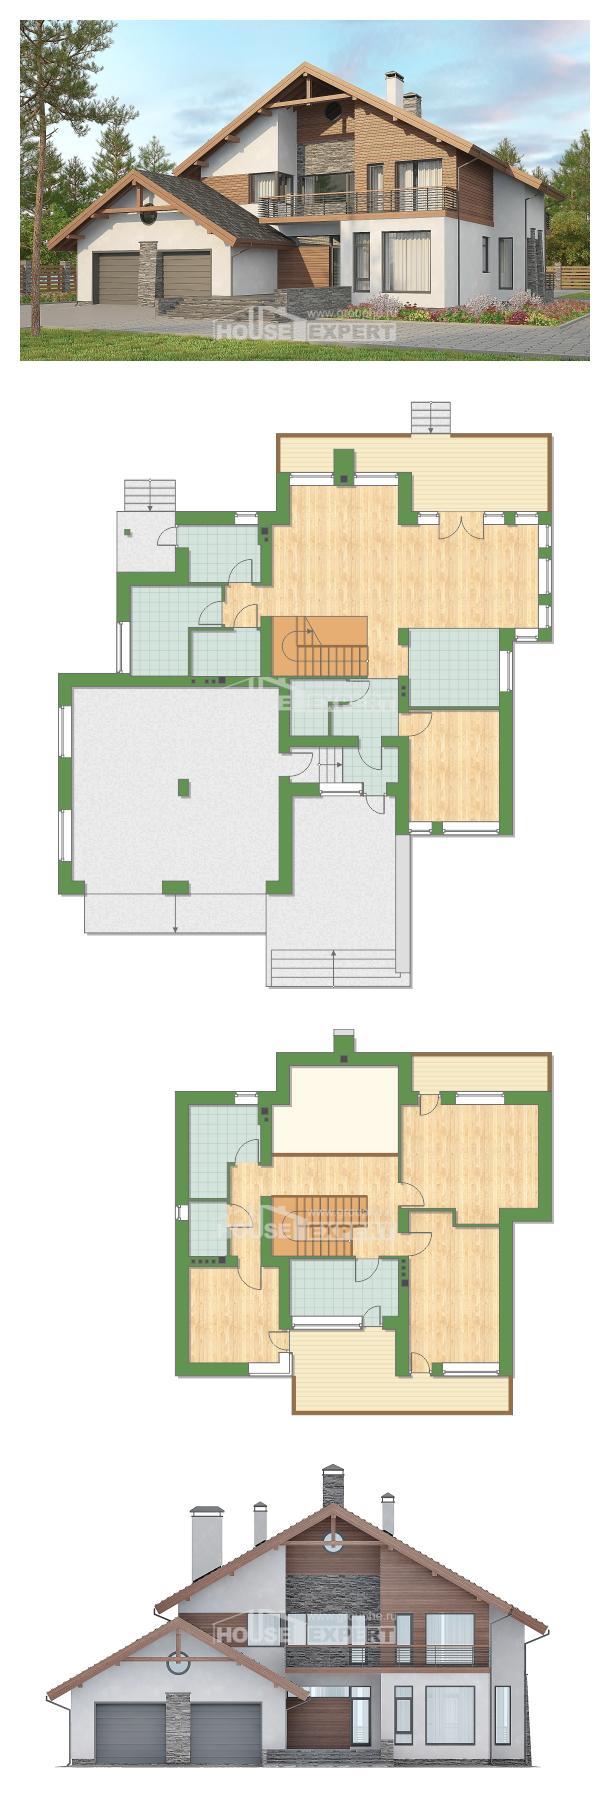 Проект дома 270-003-Л | House Expert